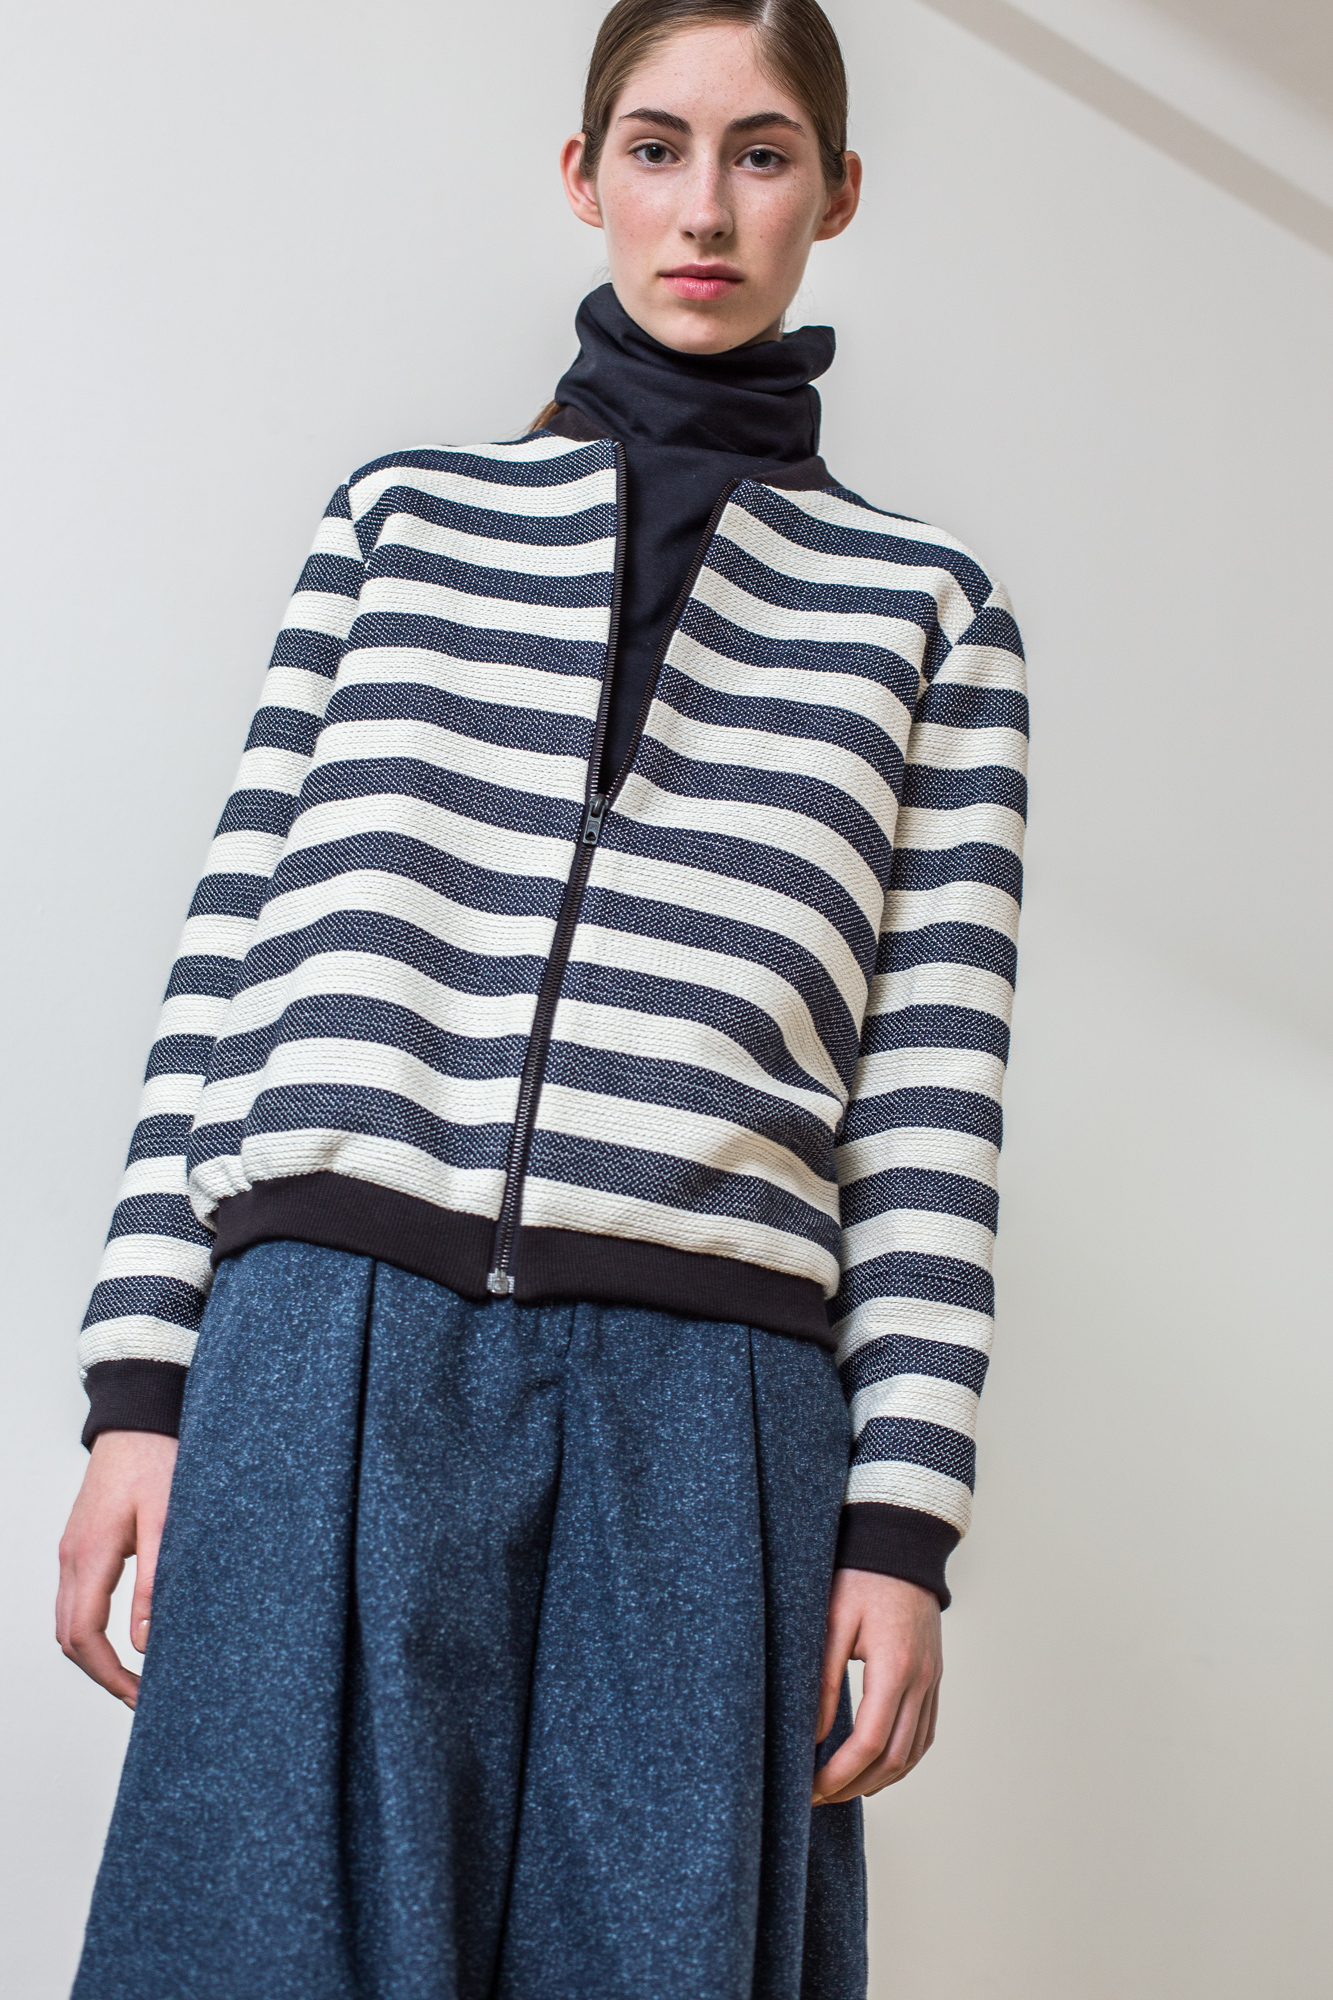 wearenotsisters_wrns_contour-jacket_01